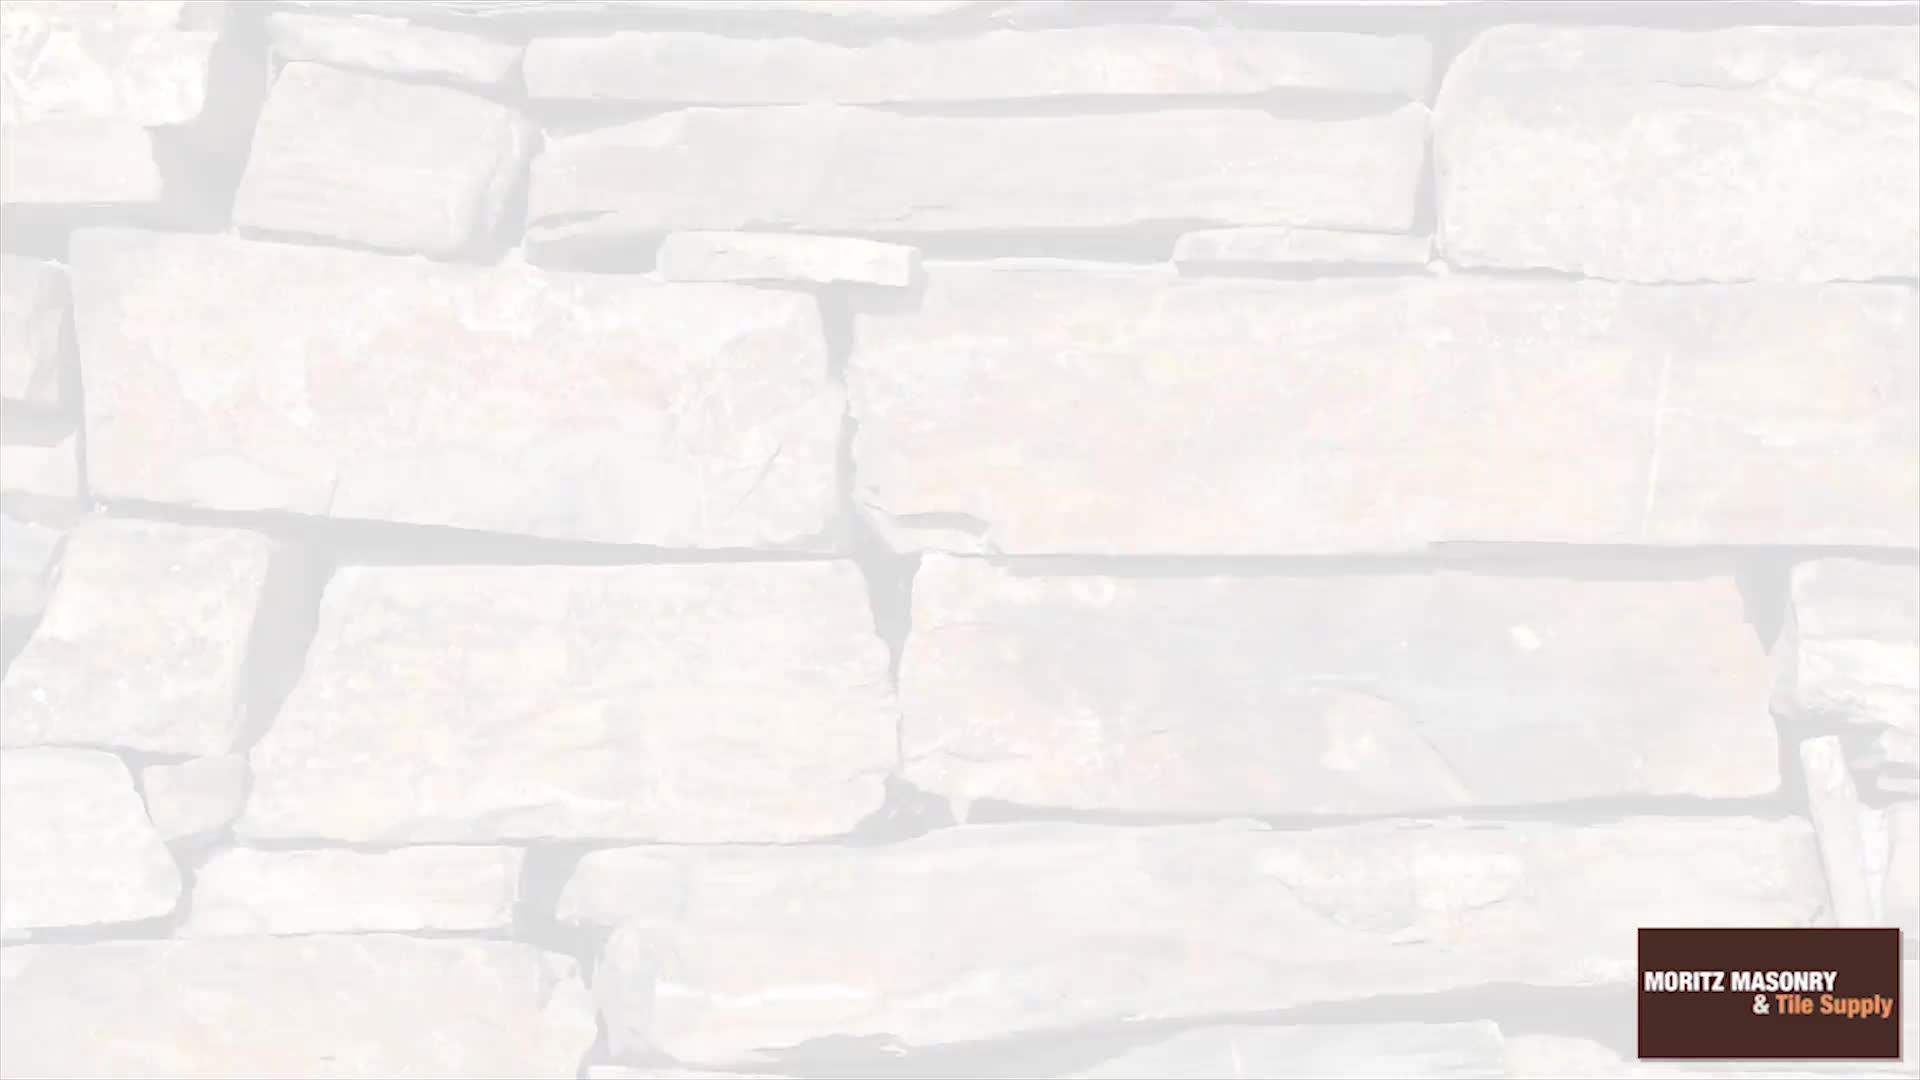 Moritz Masonry & Tile Supply - Common, Face & Interlocking Bricks - 403-527-3673